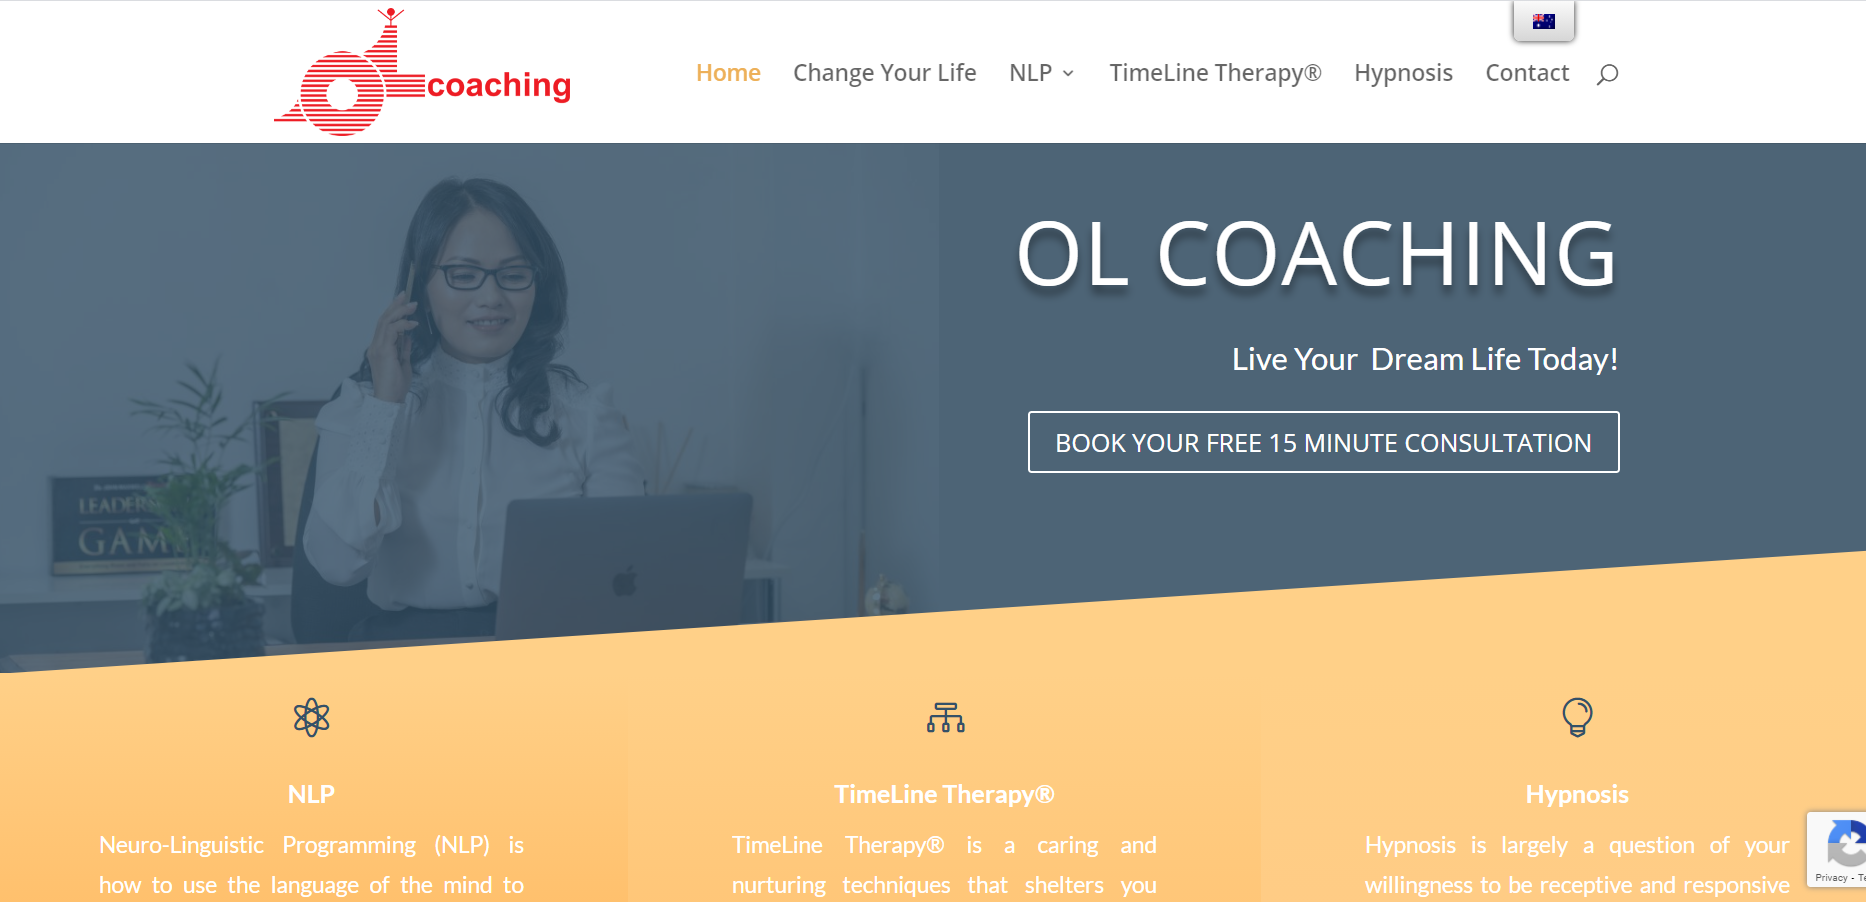 OL Coaching